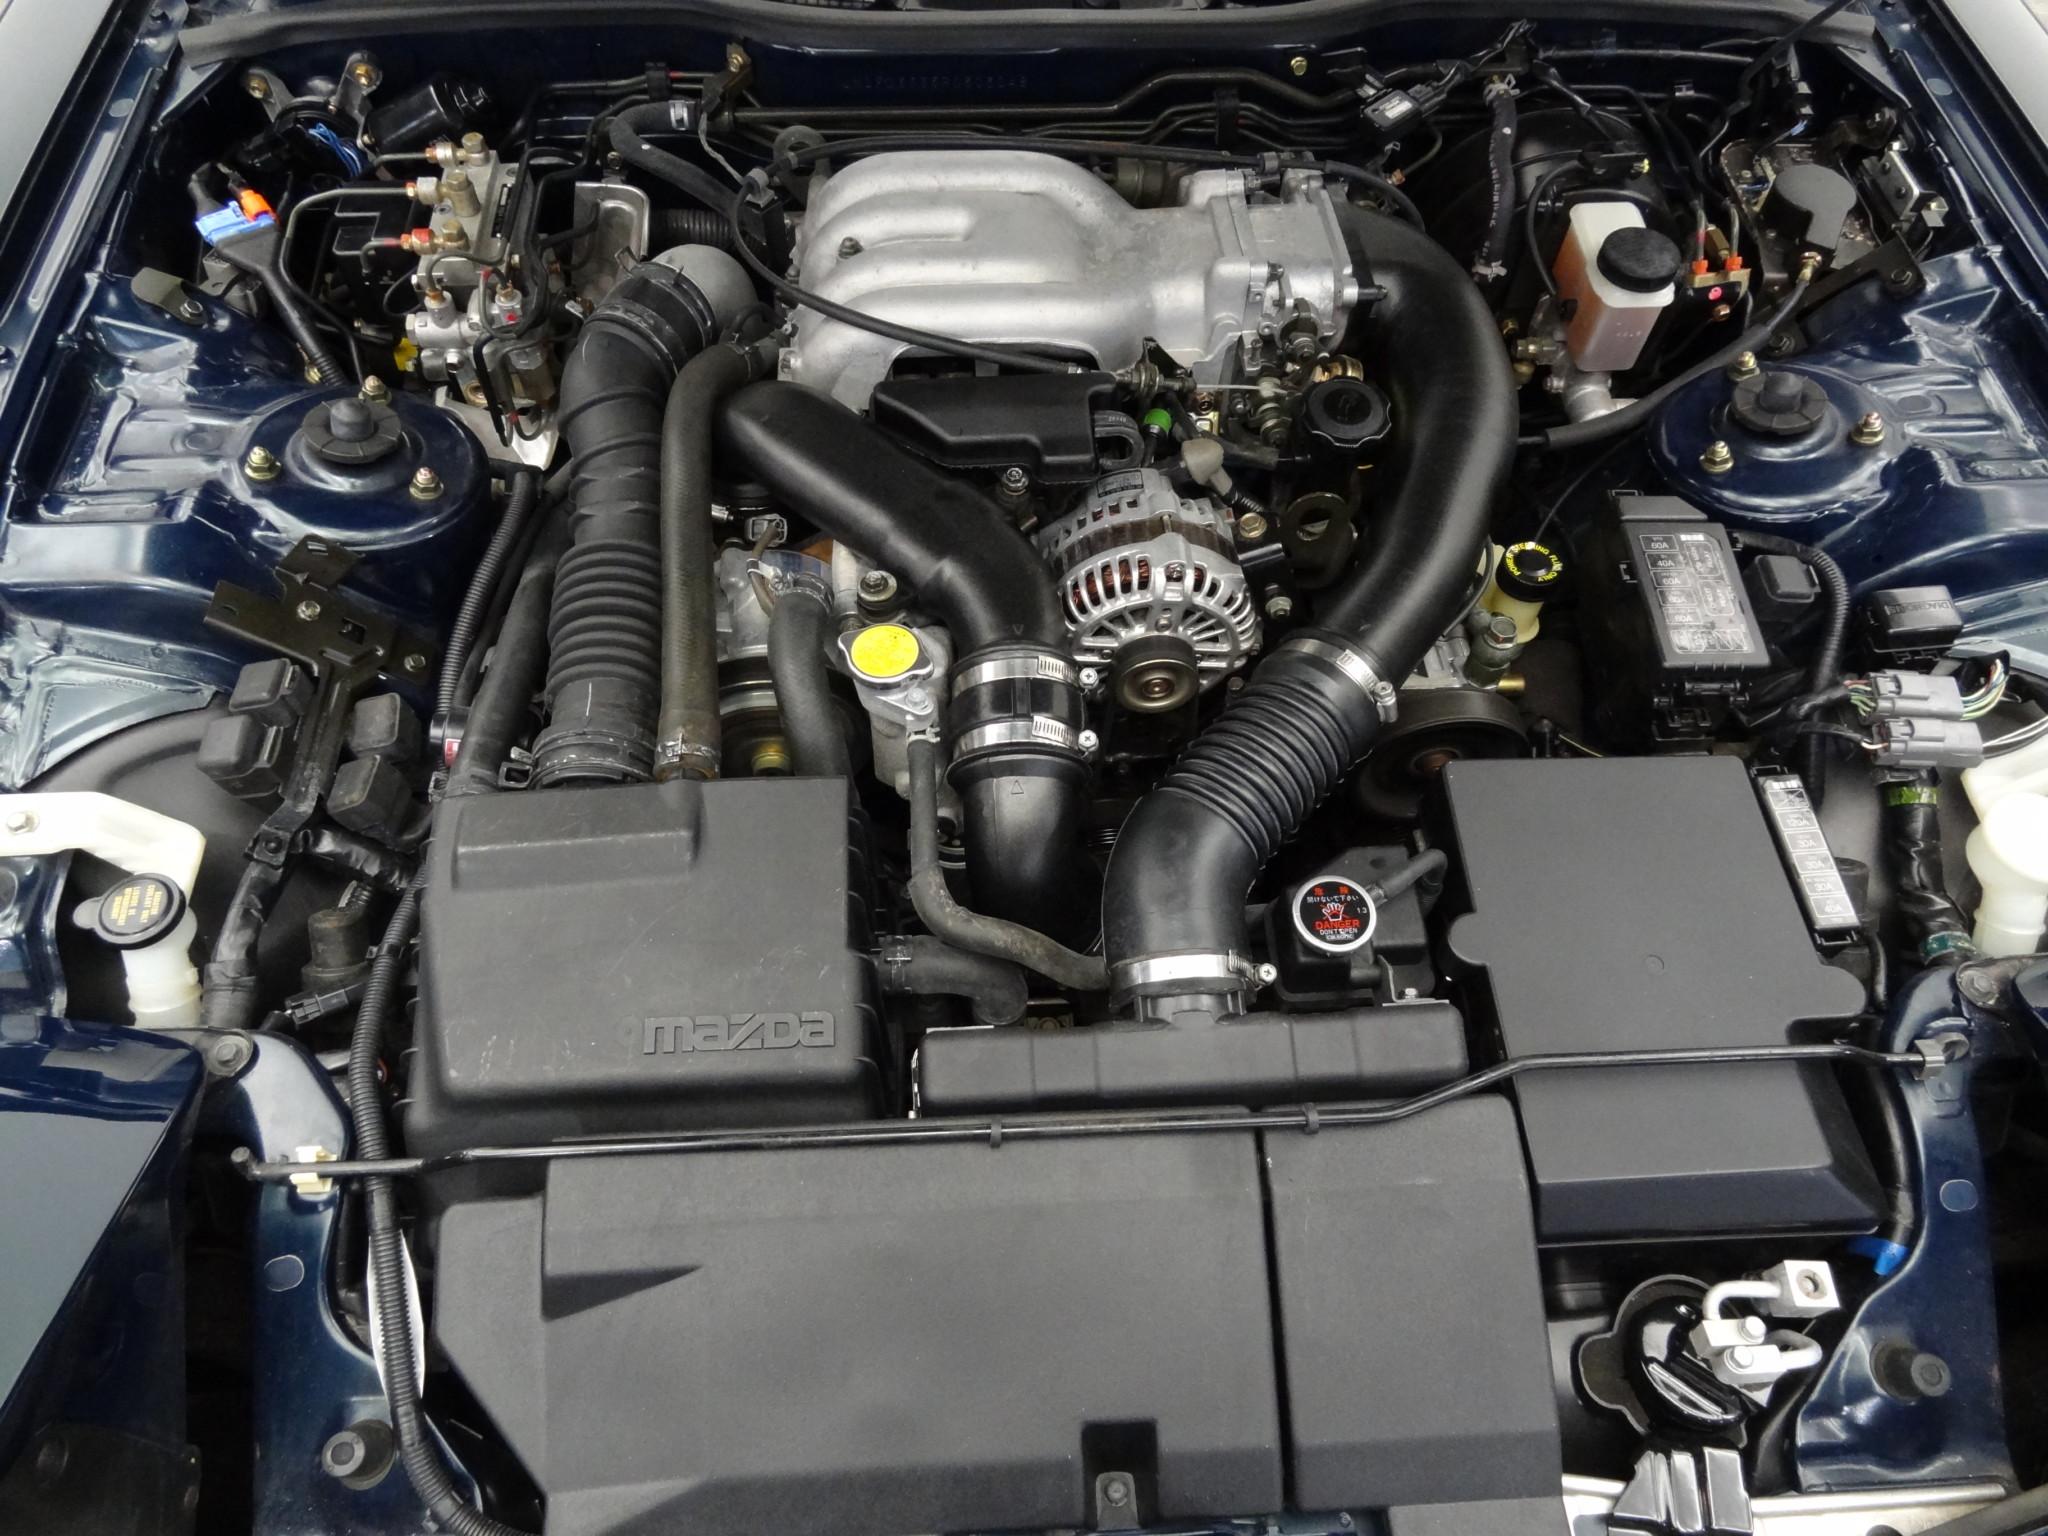 1994 Mazda RX-7 engine